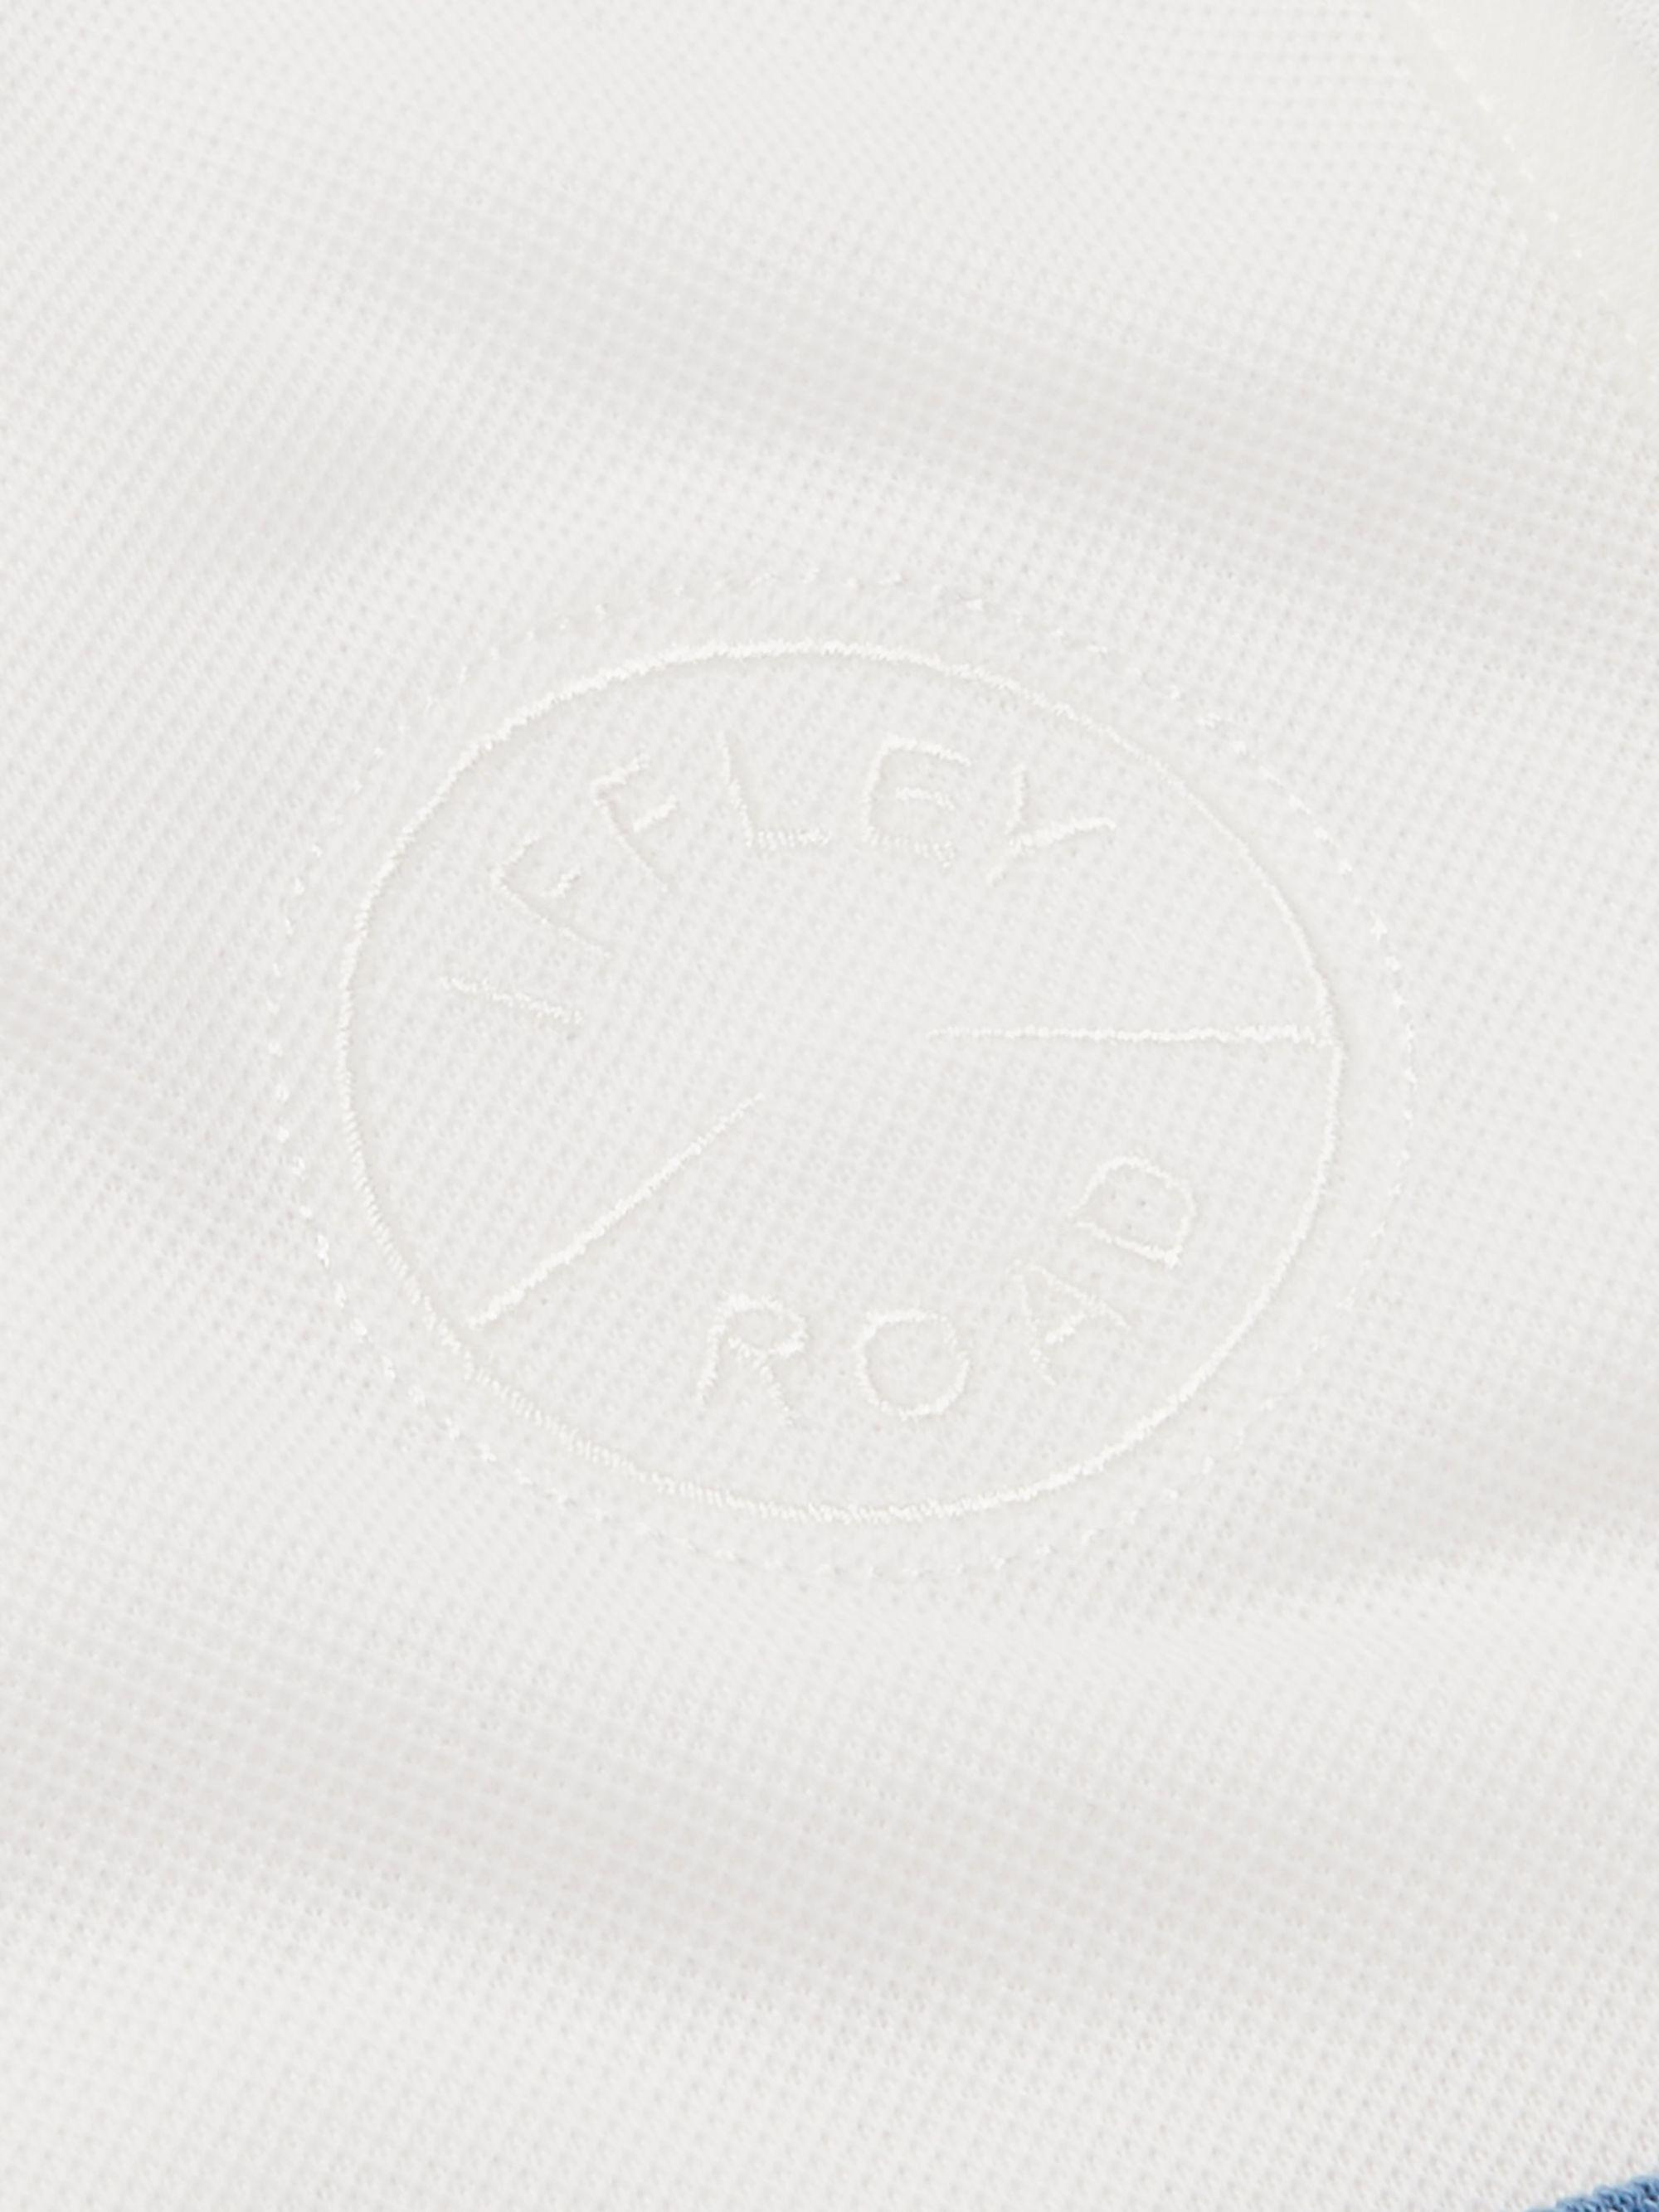 Lancaster Slim-Fit Striped Drirelease Piqué Tank Top